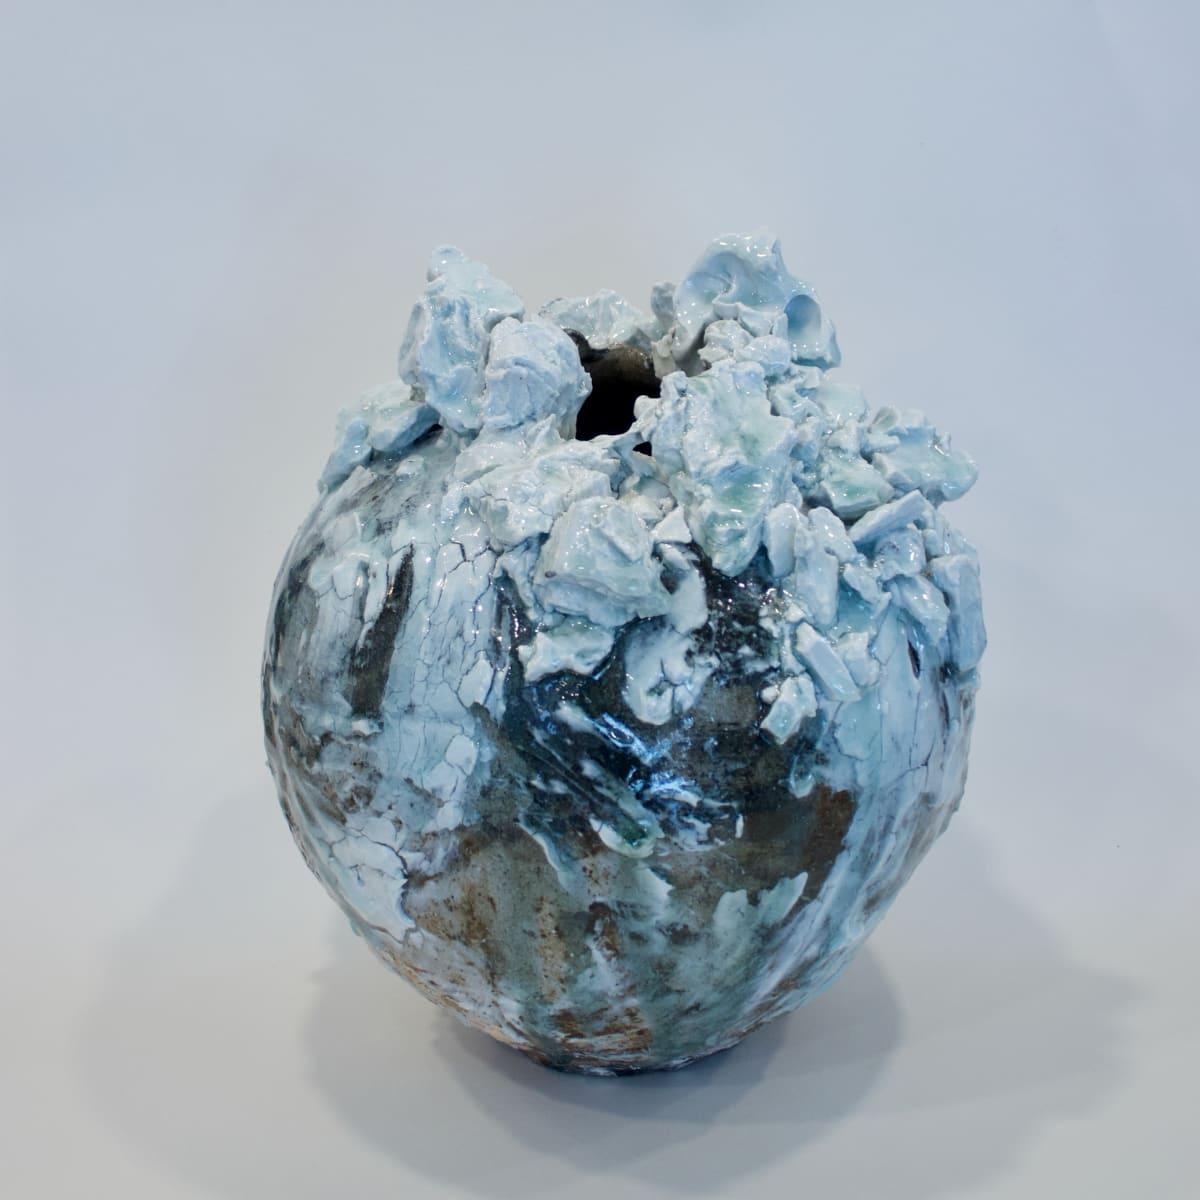 Akiko Hirai Small Moon Jar, 2019 Ceramic Stoneware with Porcelain Inclusions 31 x 26 x 26 cm 12 1/4 x 10 1/4 x 10 1/4 in